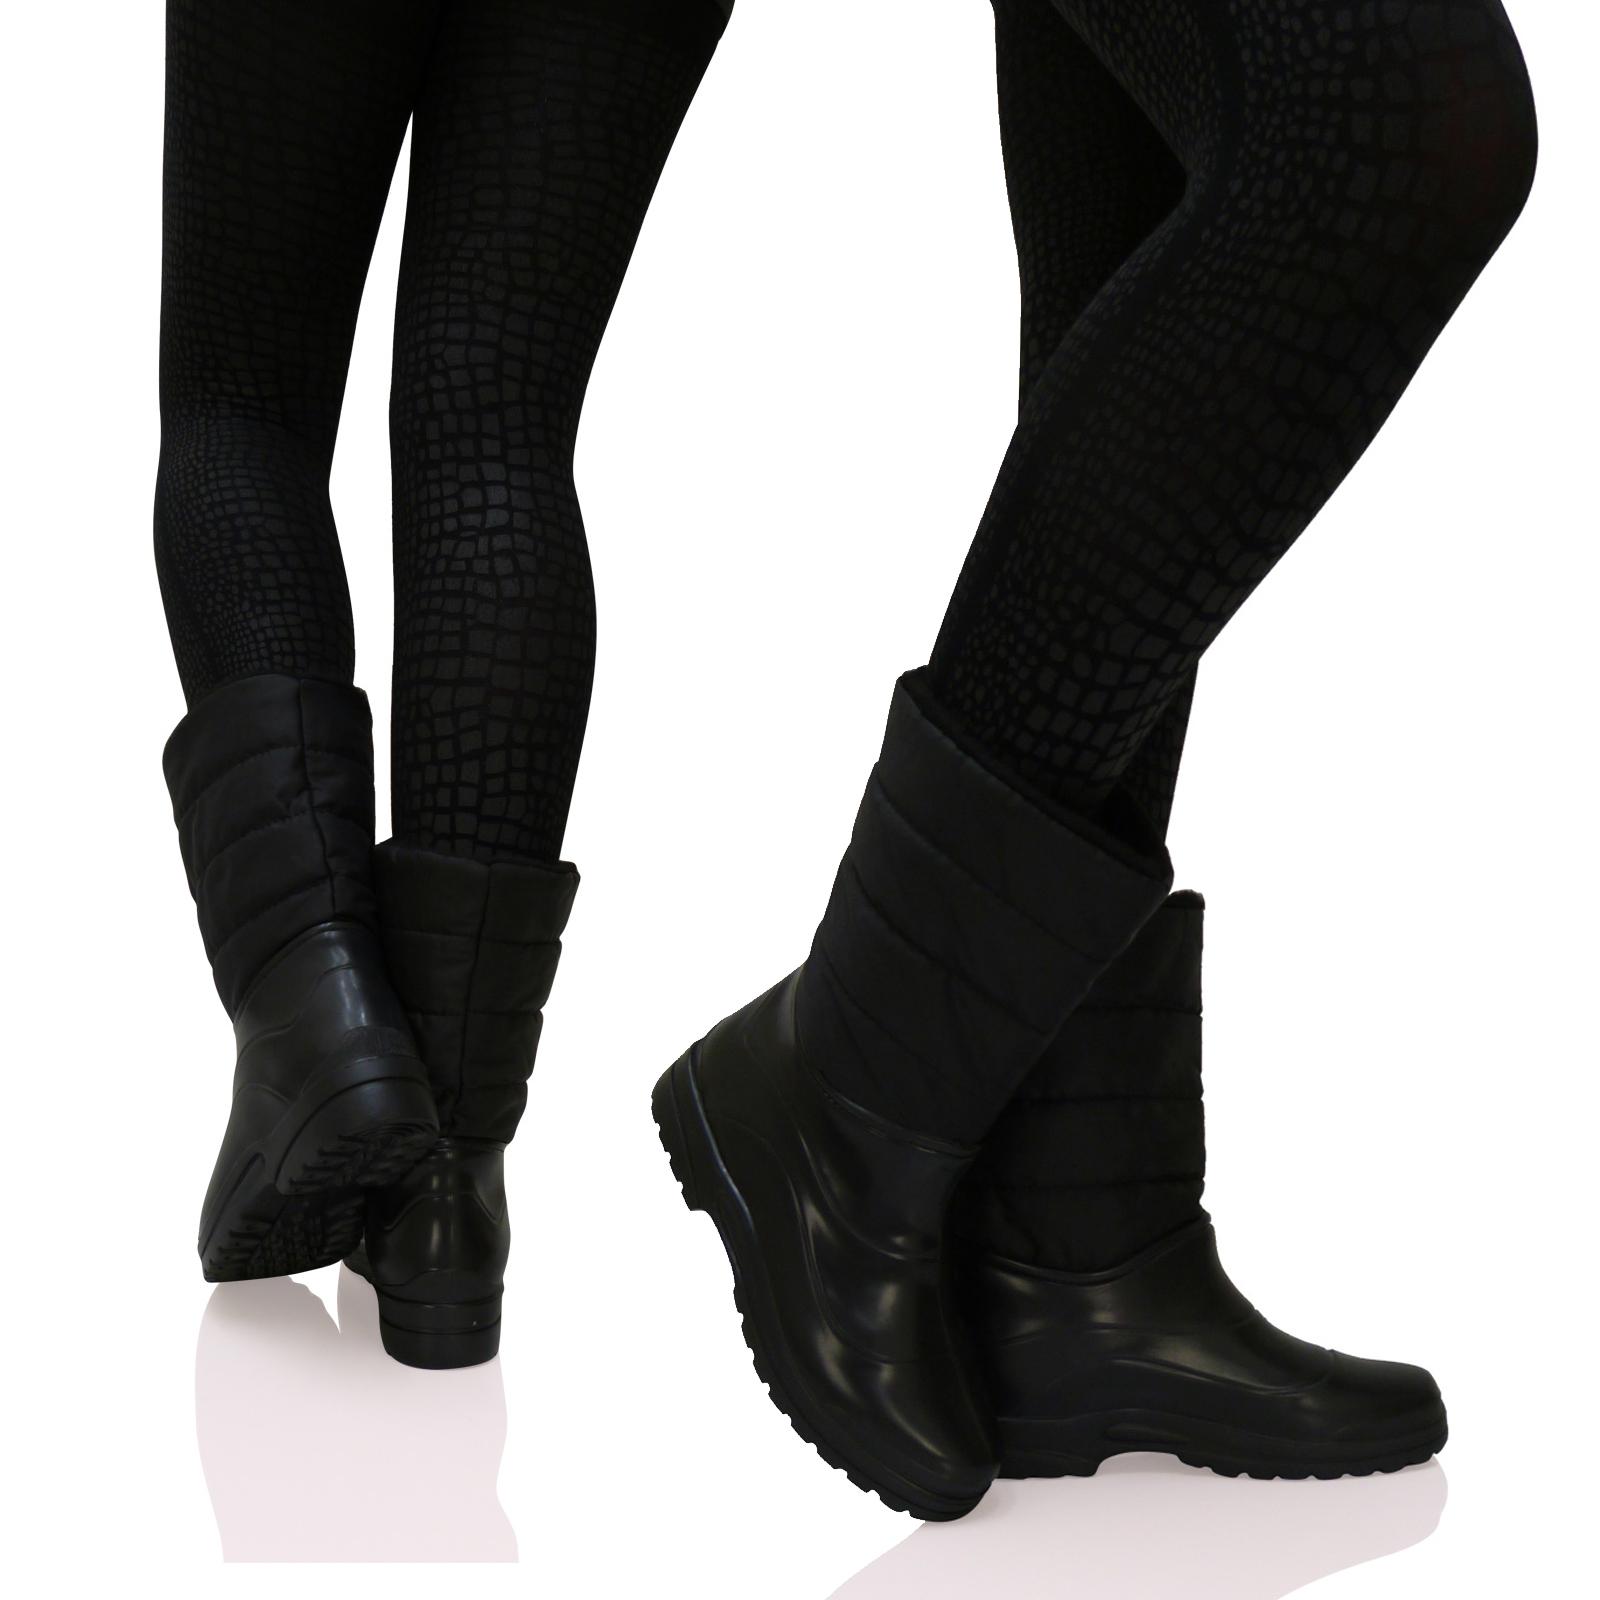 damen wasserdicht winter schnee flache kn chelhohe stiefel. Black Bedroom Furniture Sets. Home Design Ideas